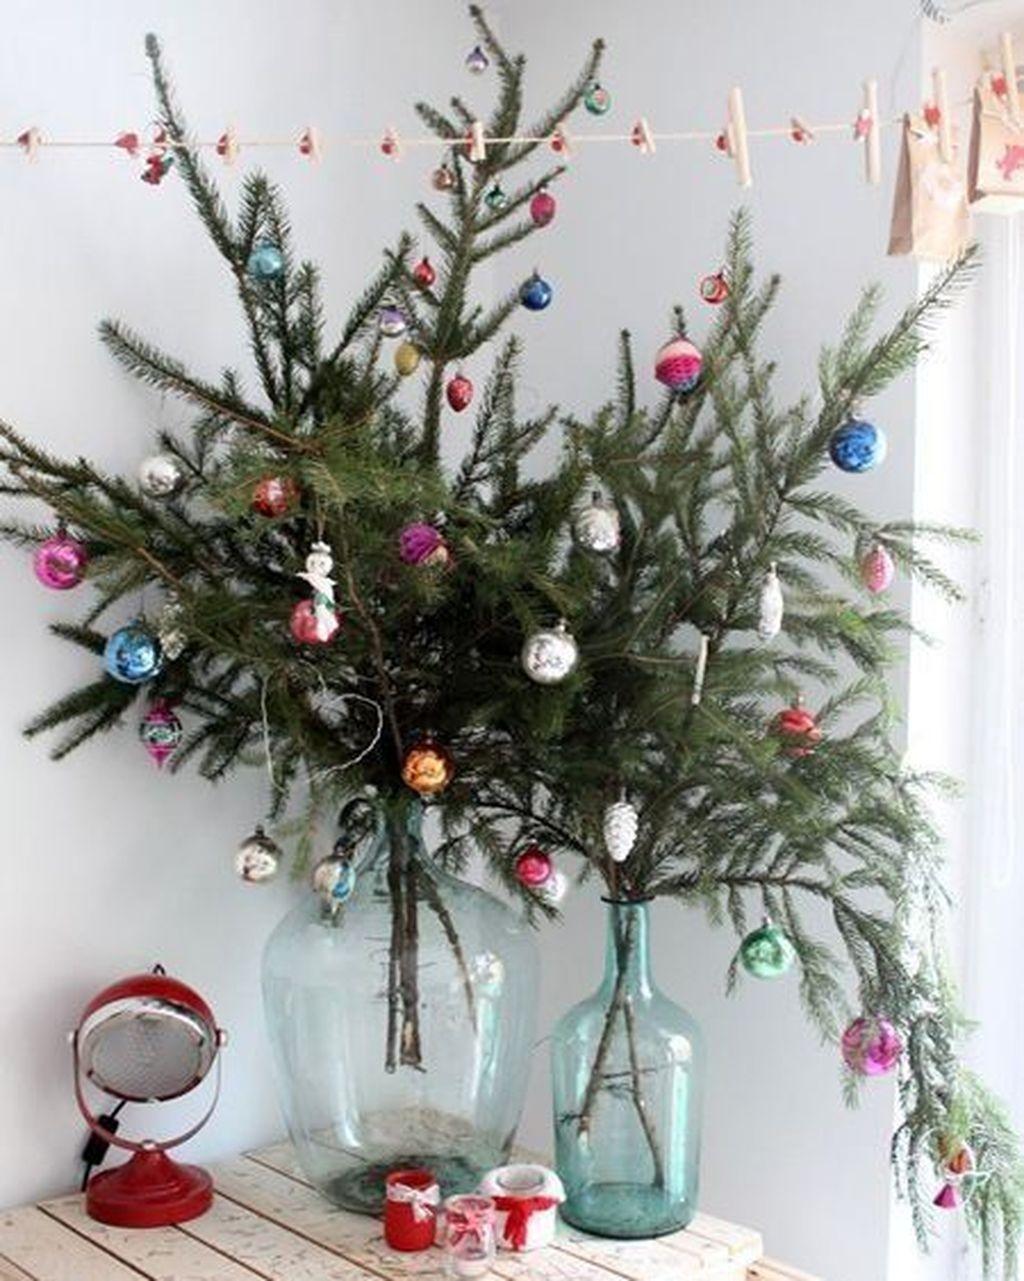 44 Small Apartment Christmas Decorations Ideas #smallapartmentchristmasdecor